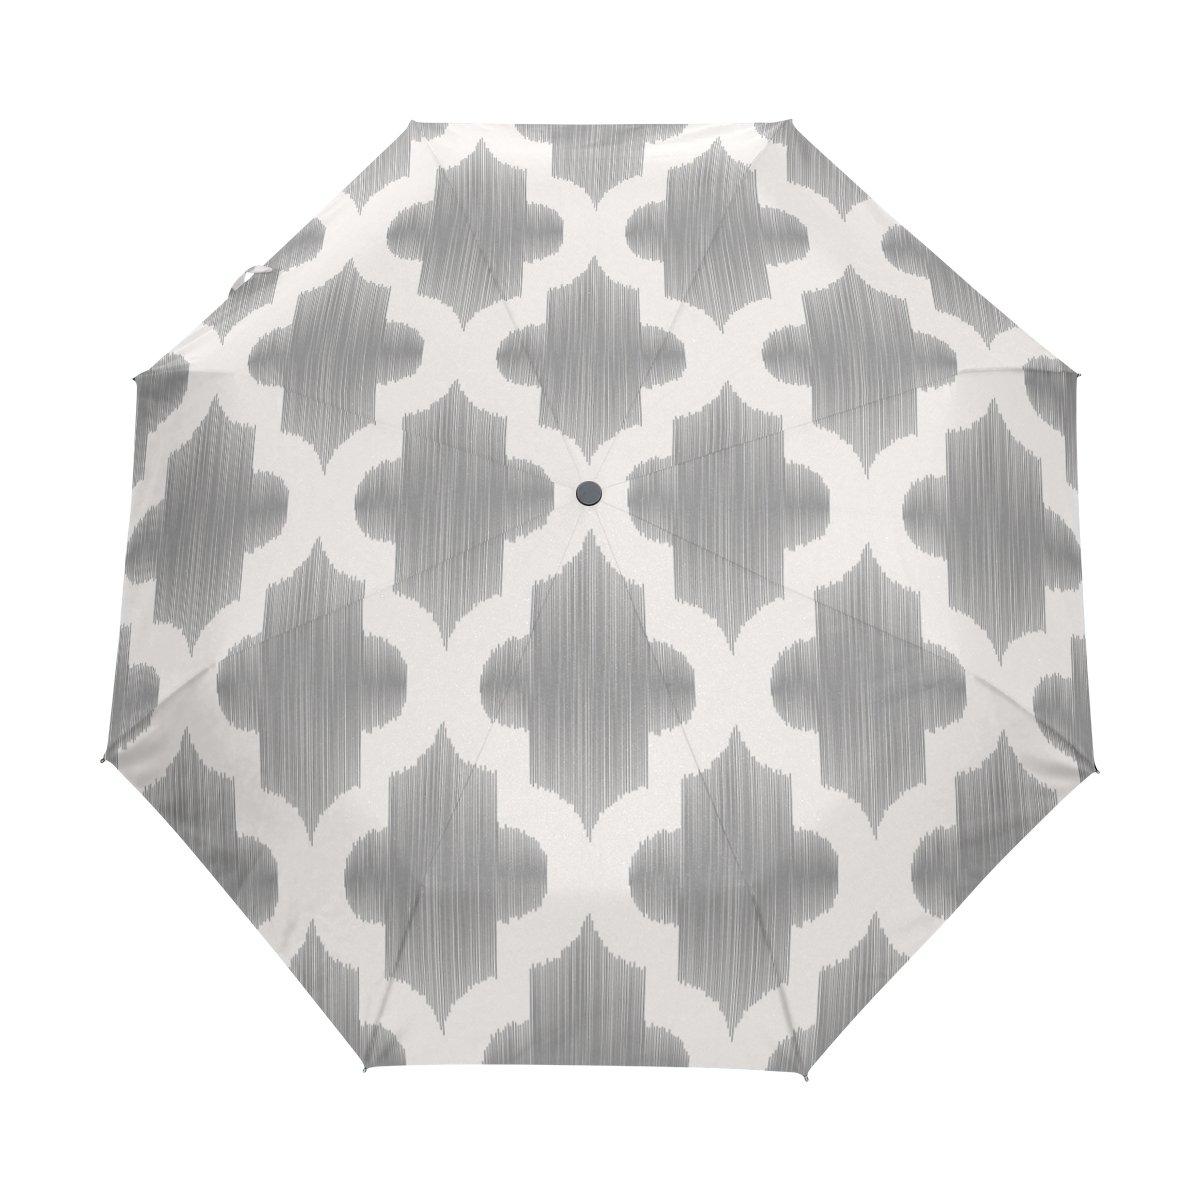 e341617fee99 GIOVANIOR White Grey Islamic Umbrella Double Sided Canopy Auto Open ...